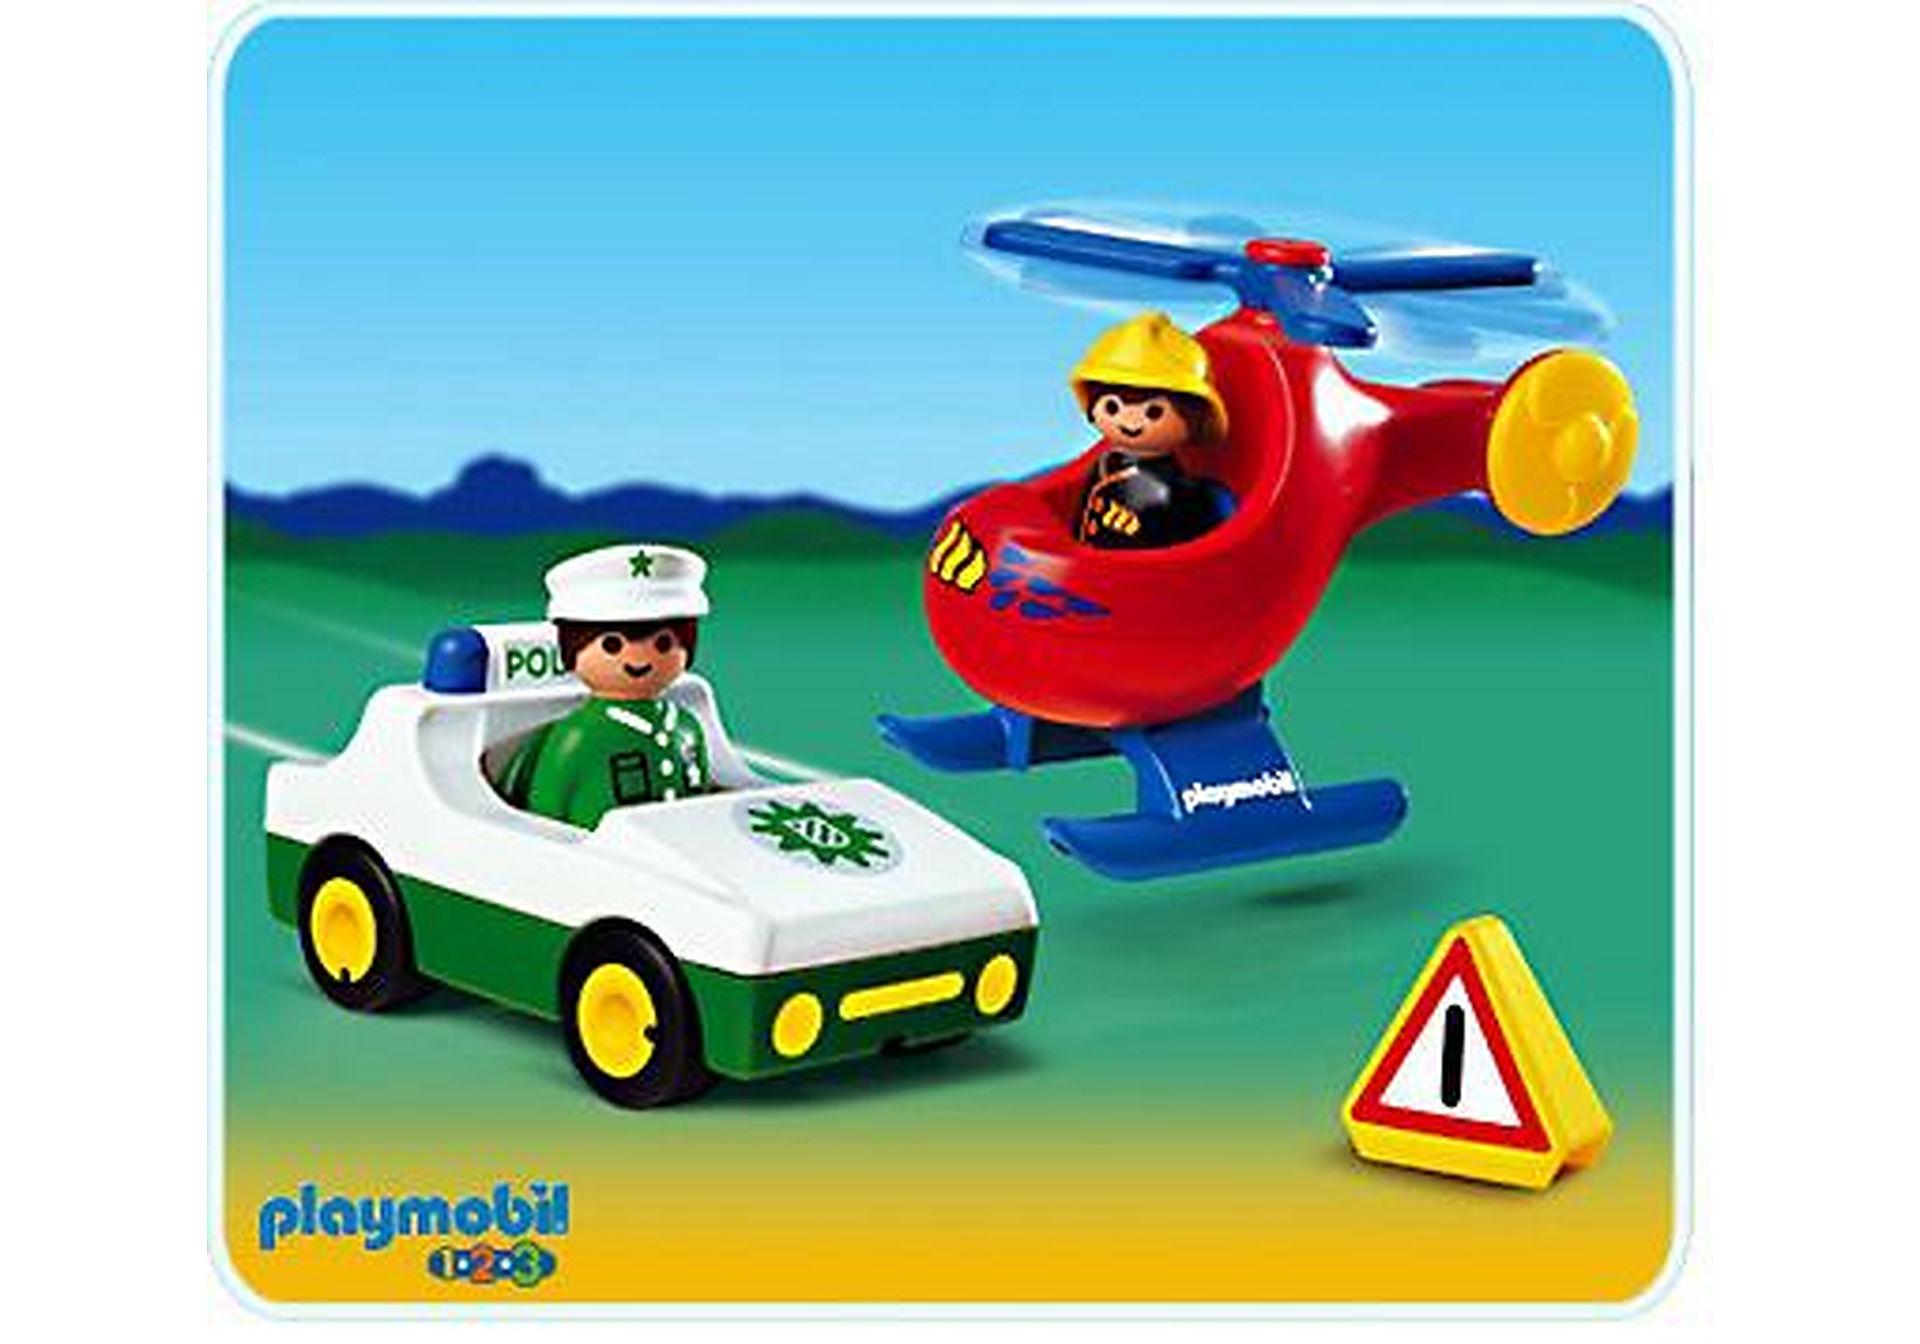 http://media.playmobil.com/i/playmobil/6622-A_product_detail/Rettungsset